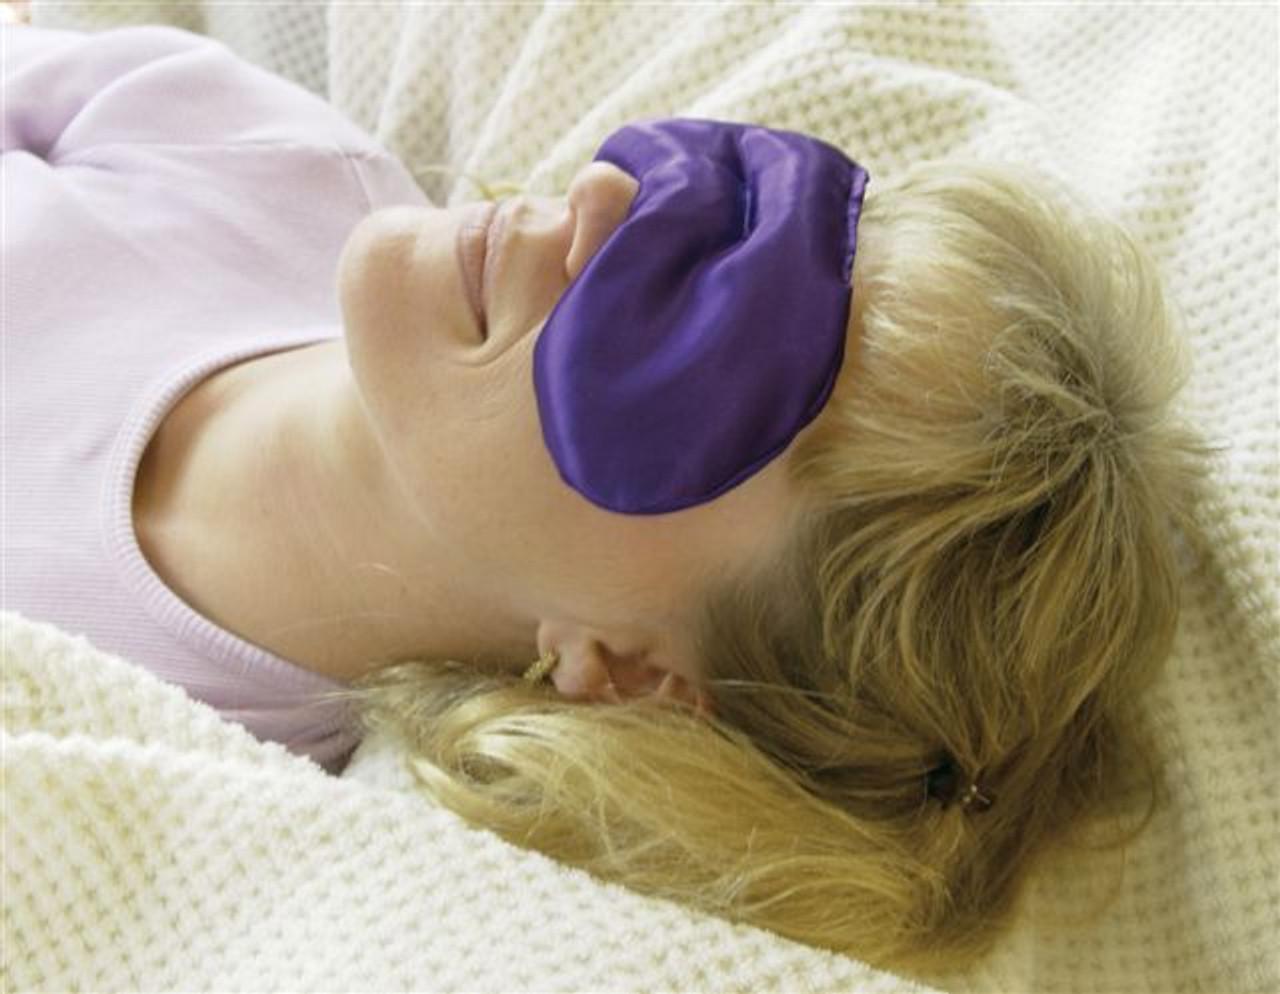 Eye Sinus Pack - Sleep Mask, Eye Wrap, & Sinus Pac for Headache Relief & Sleep Aid